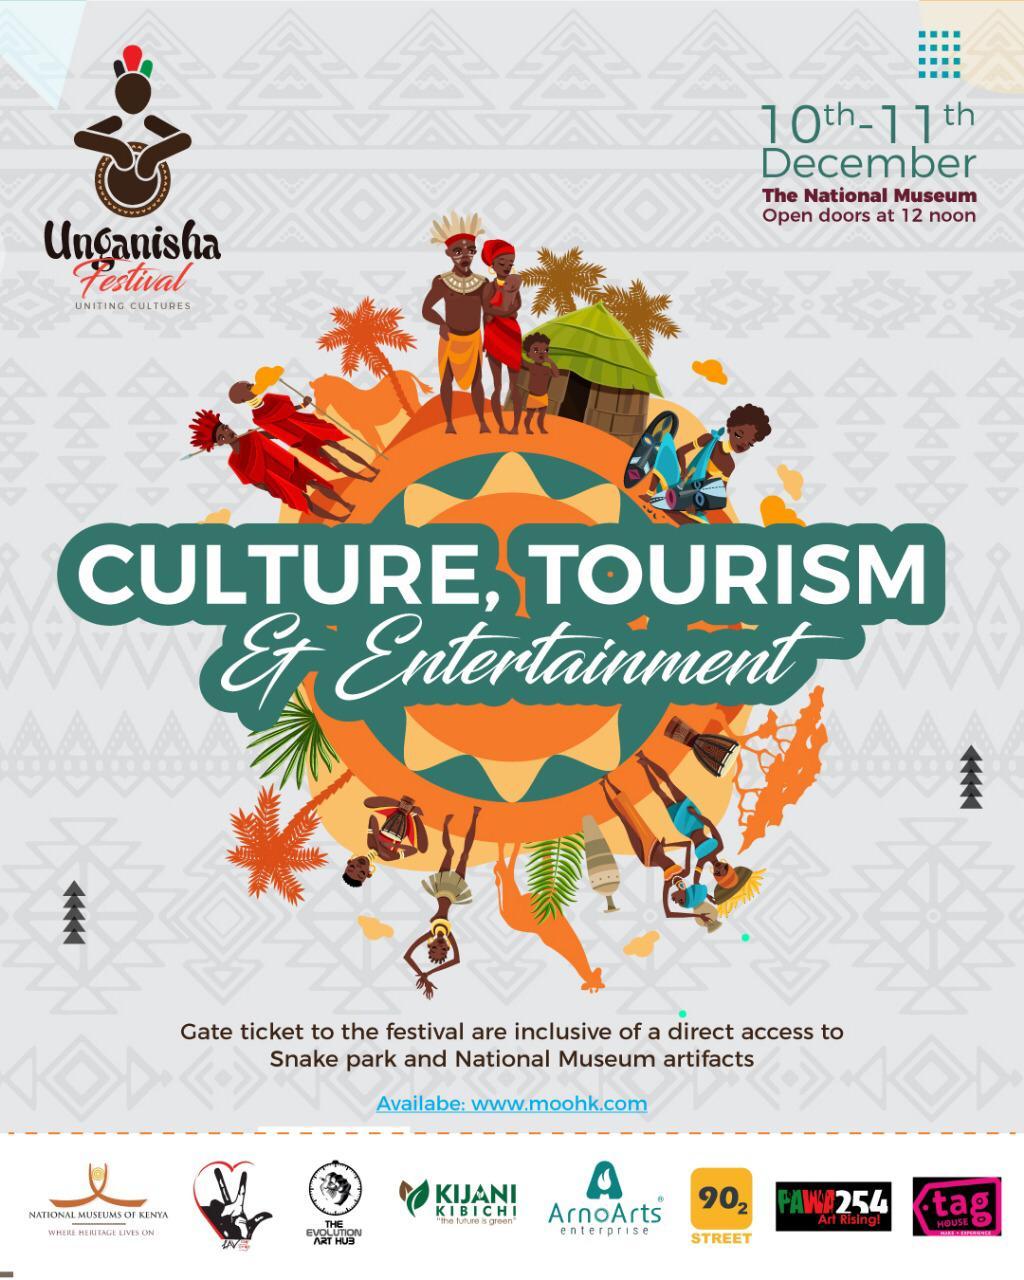 Unganisha Festival 2019